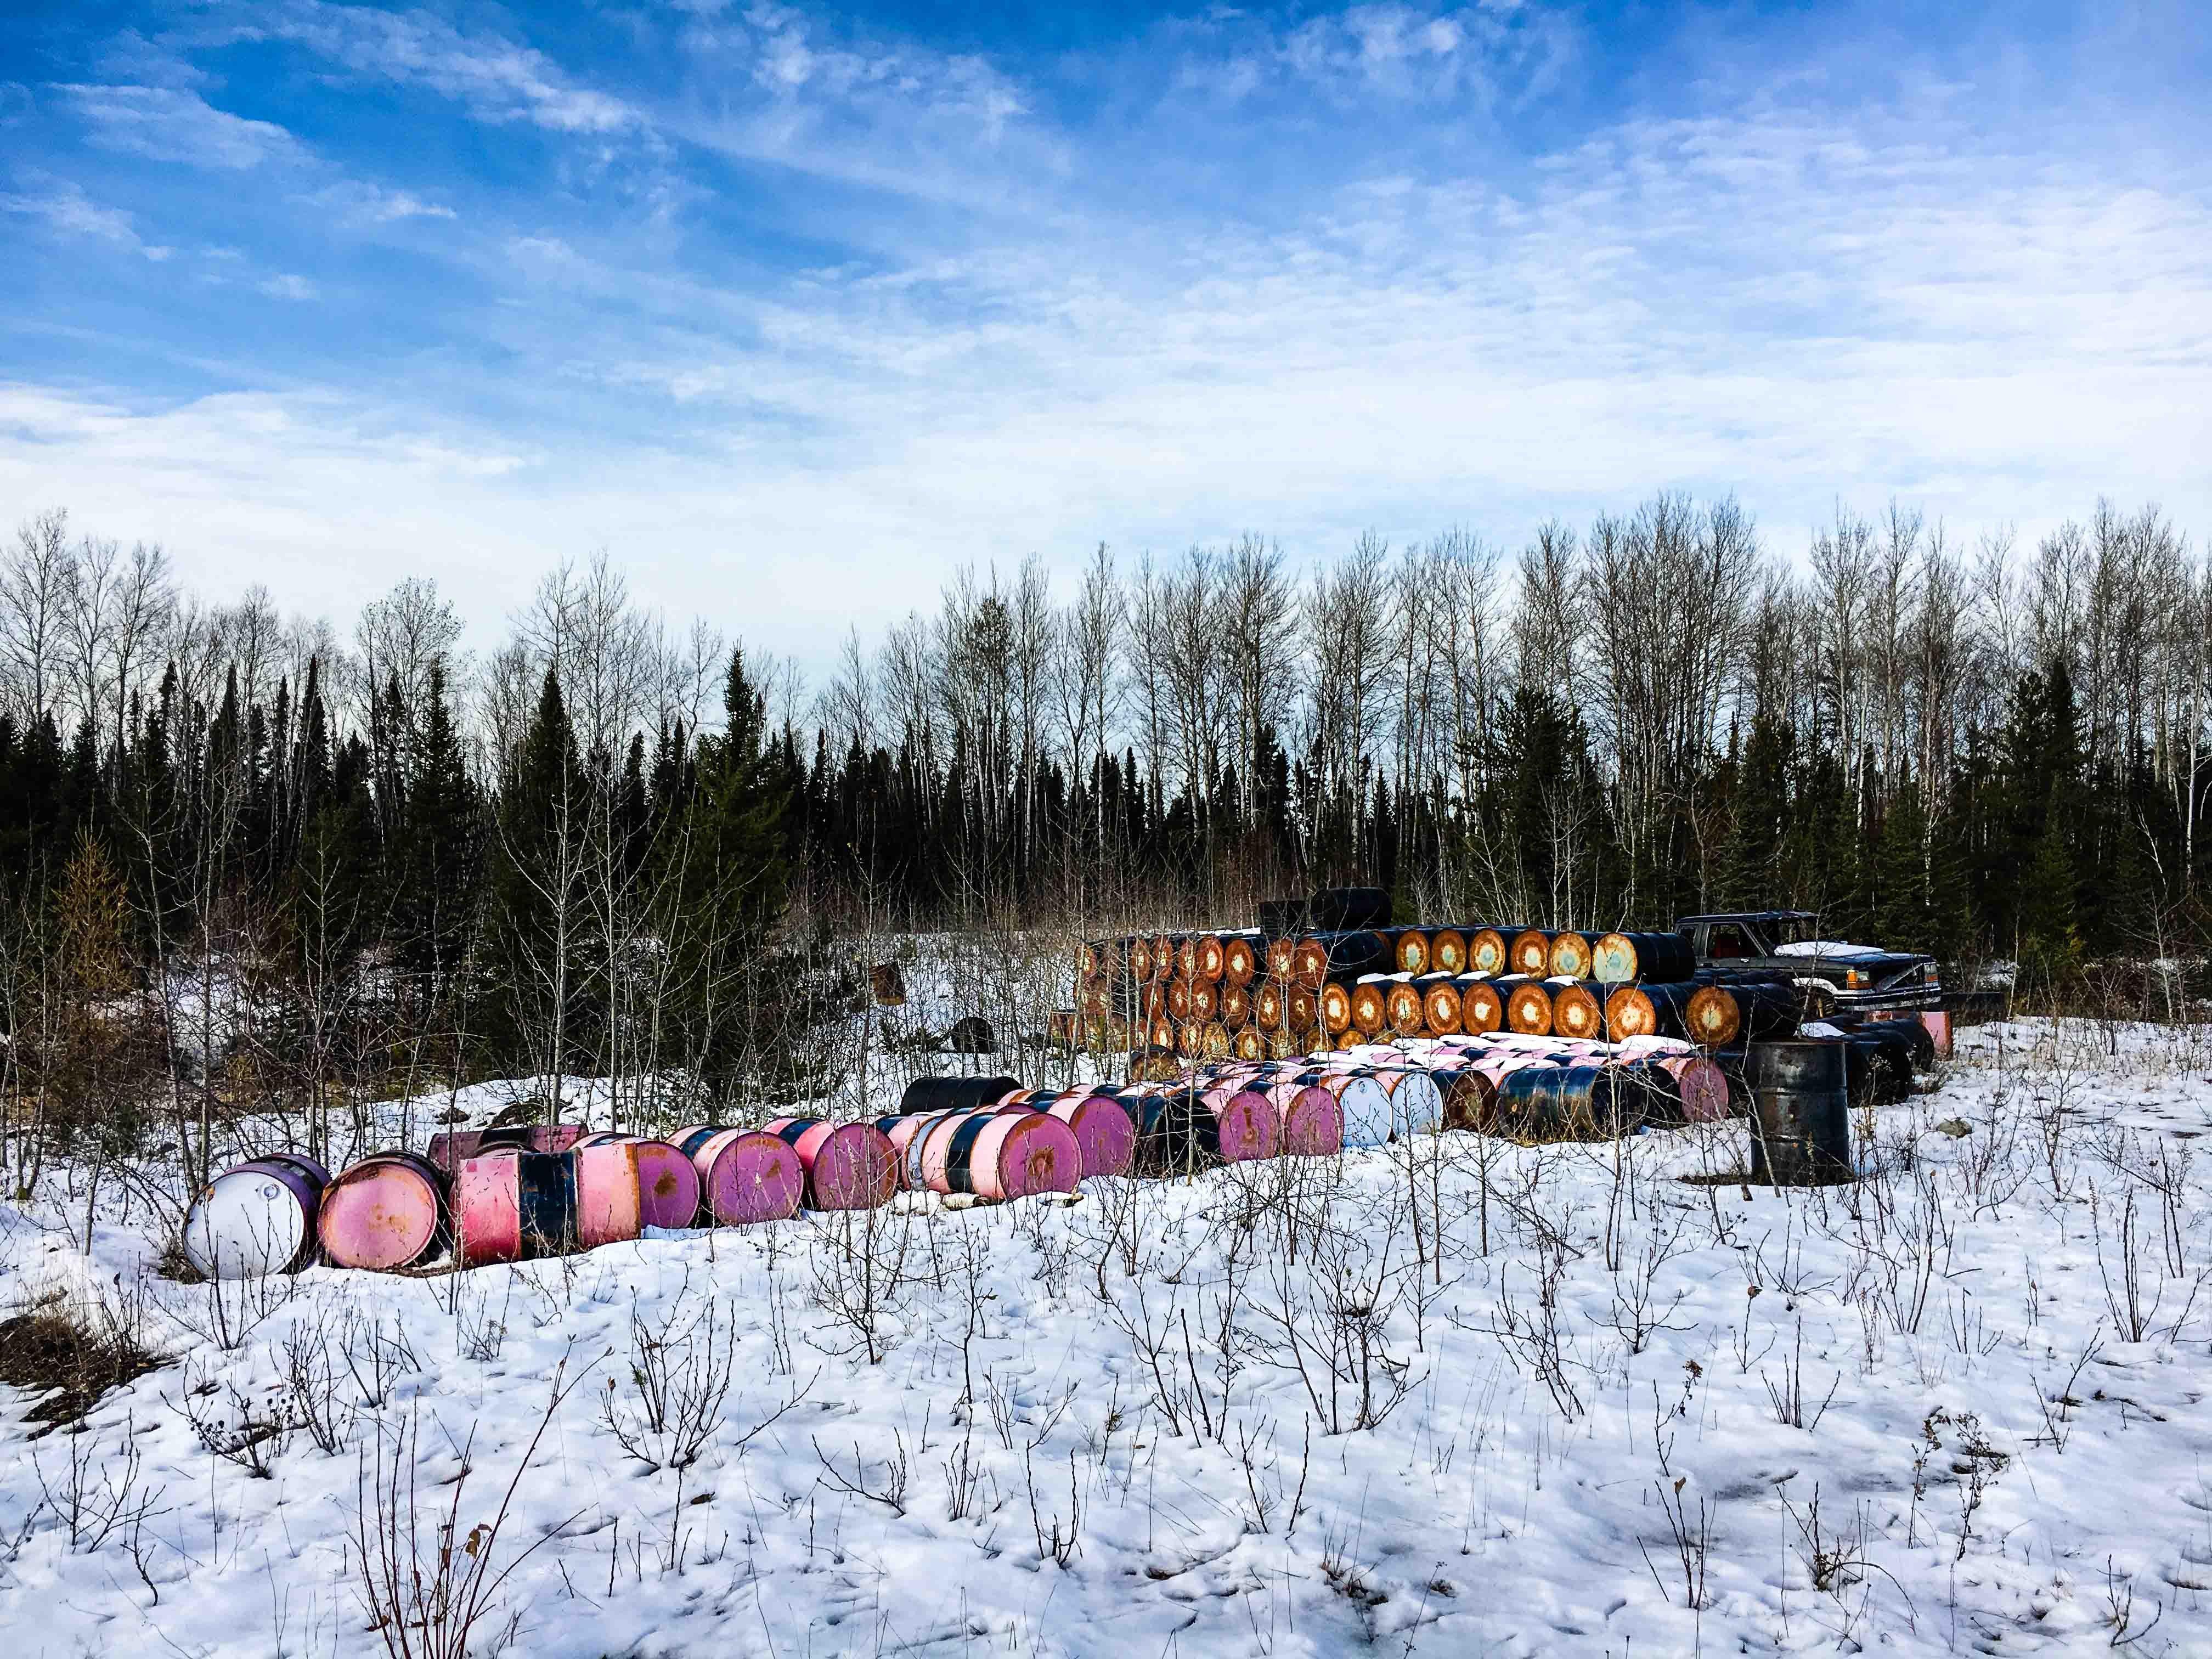 Barrels left at an abandoned mine exploration site